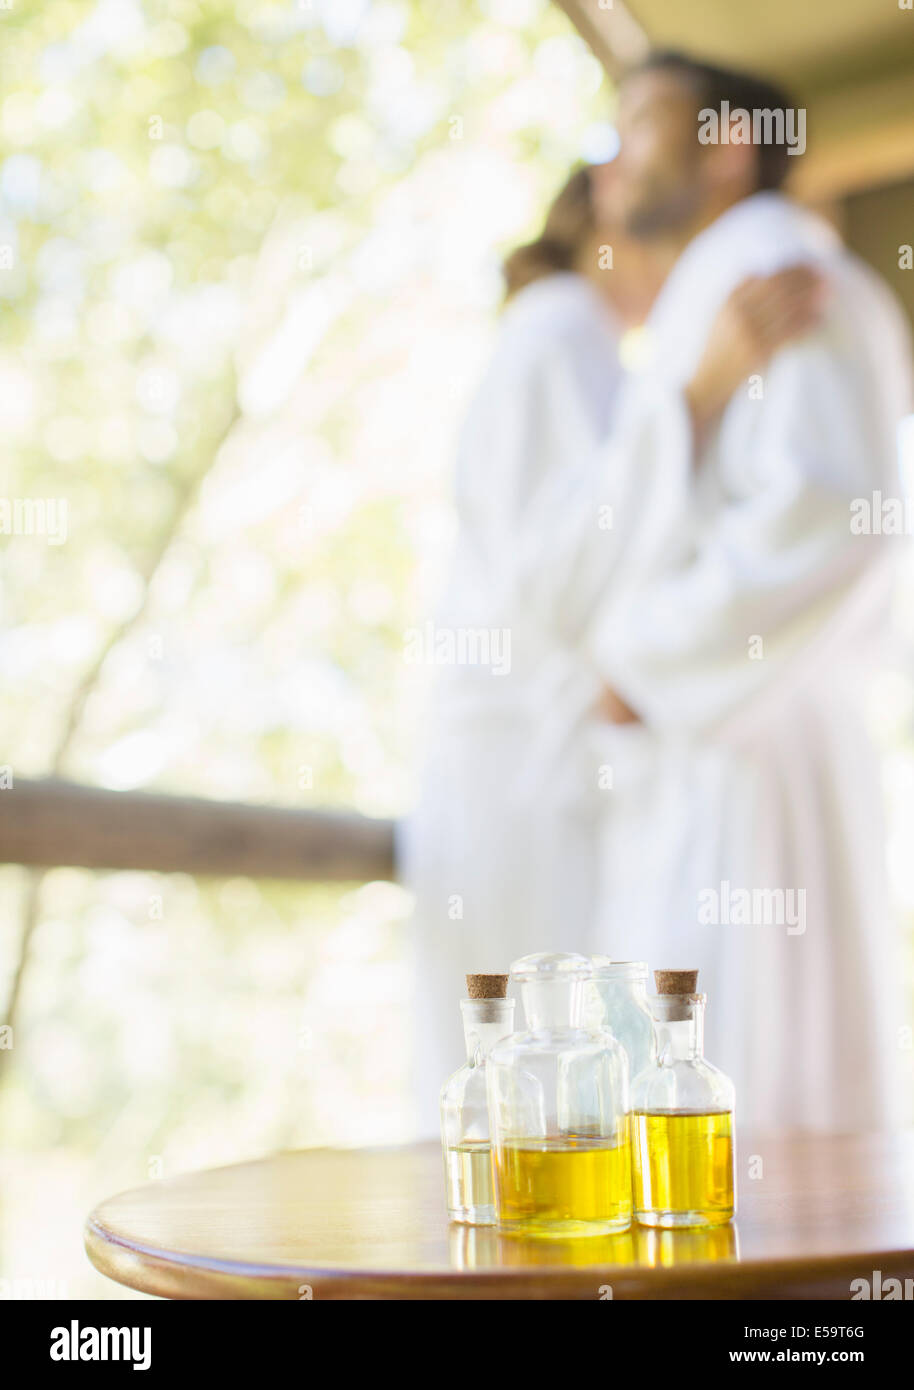 Bottles of massage oil on side table - Stock Image